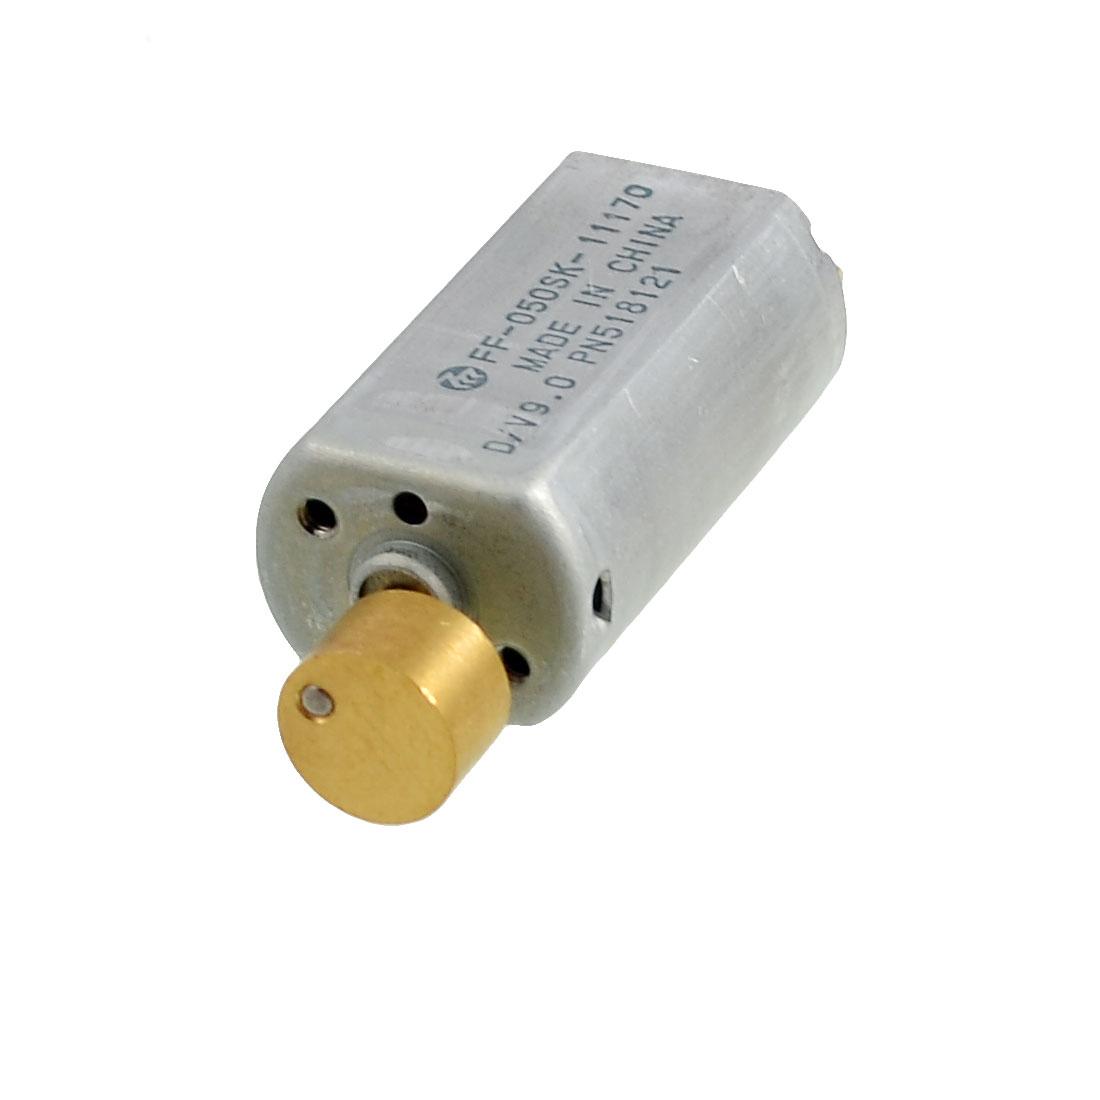 Repairing Part 12V 16000RPM 0.05A DC Mini Vibration Motor